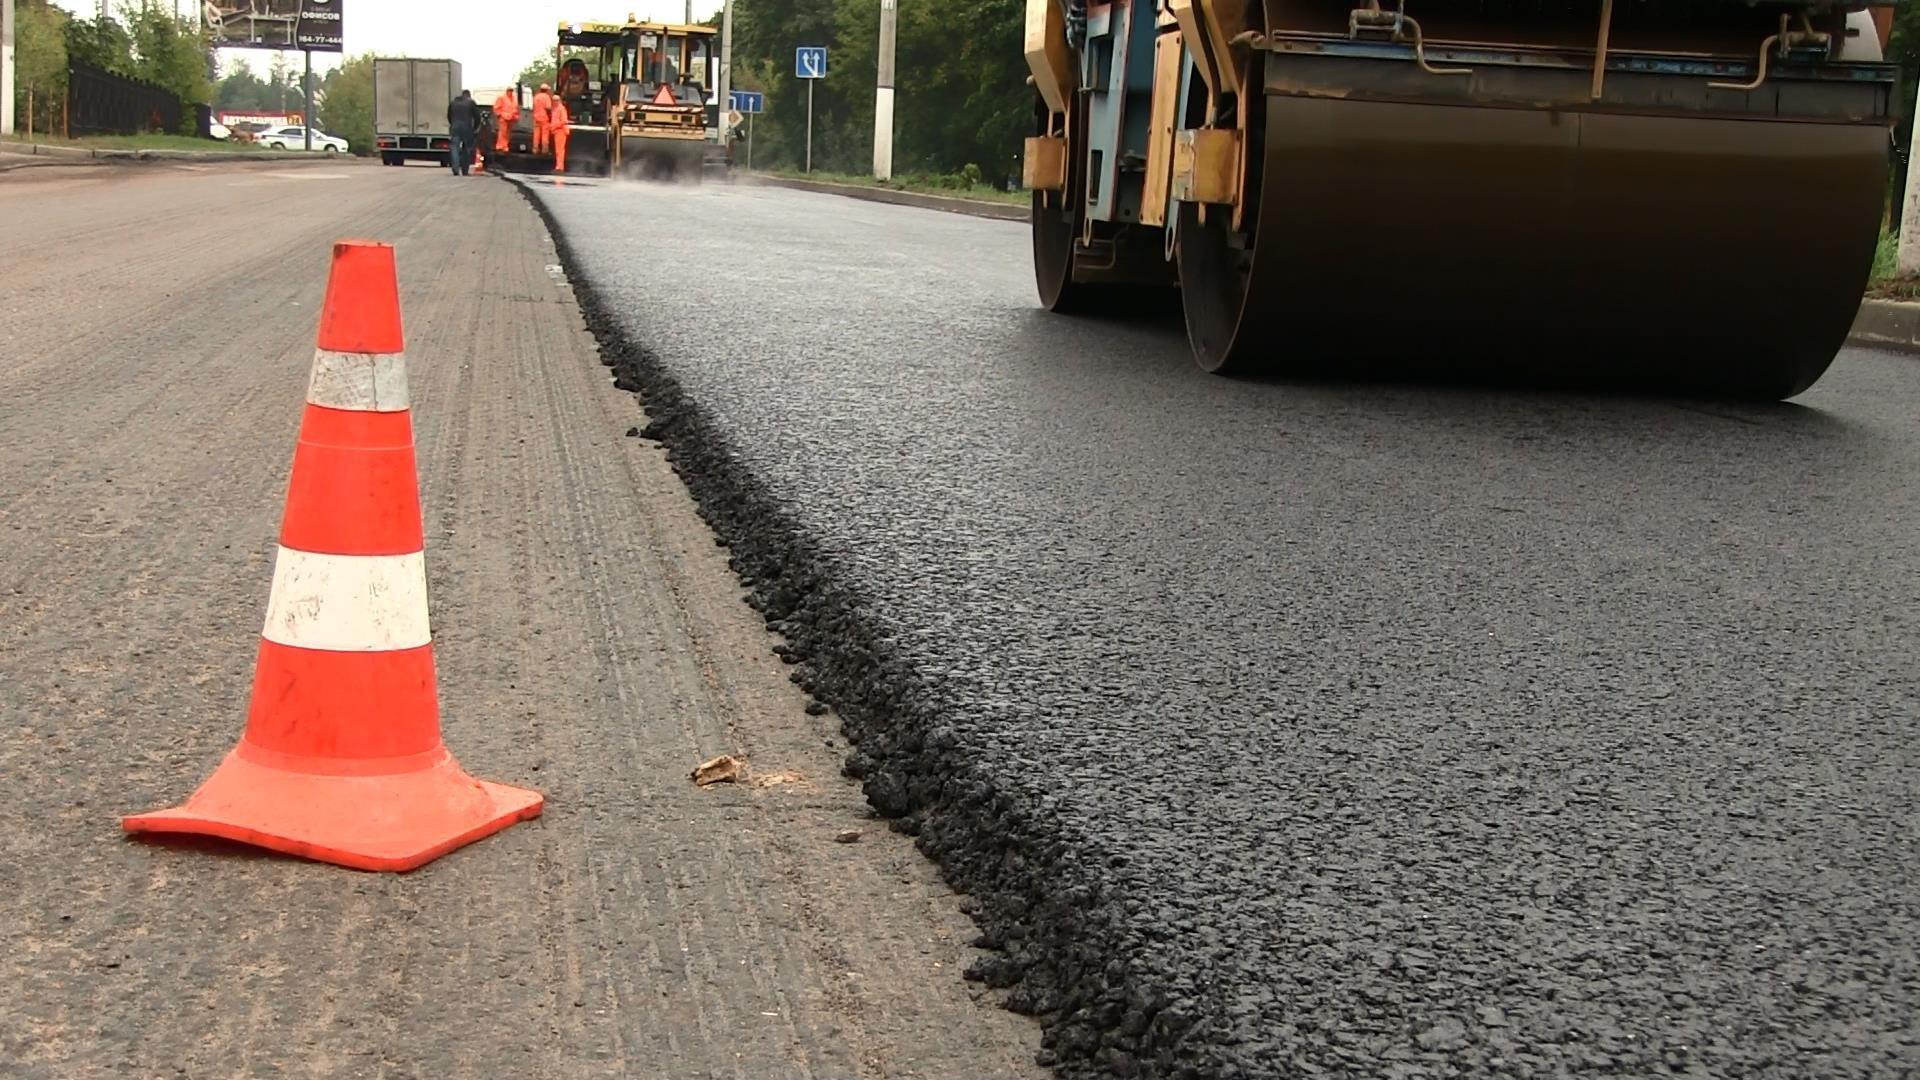 Ремонтом дорог вПетербурге займутся ВАД, АБЗ-Дорстрой и«Орион-плюс»